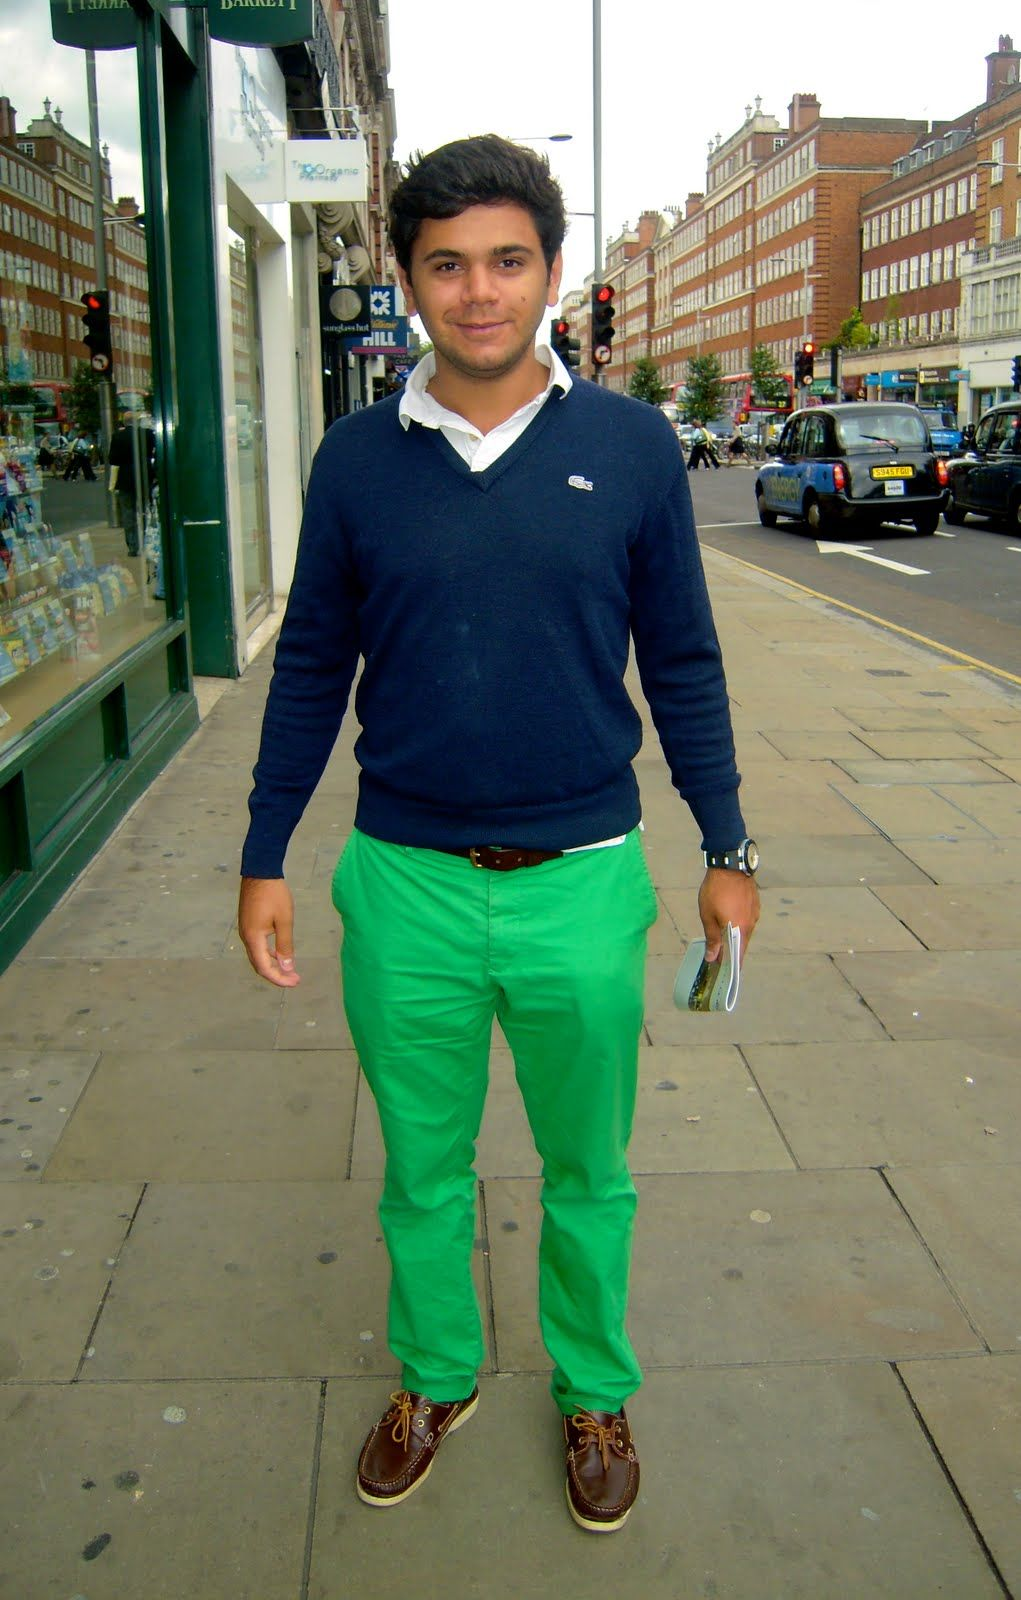 Preppy - Lilly Pulitzer Print Pants | Preppy Men's Fashion | Pinterest